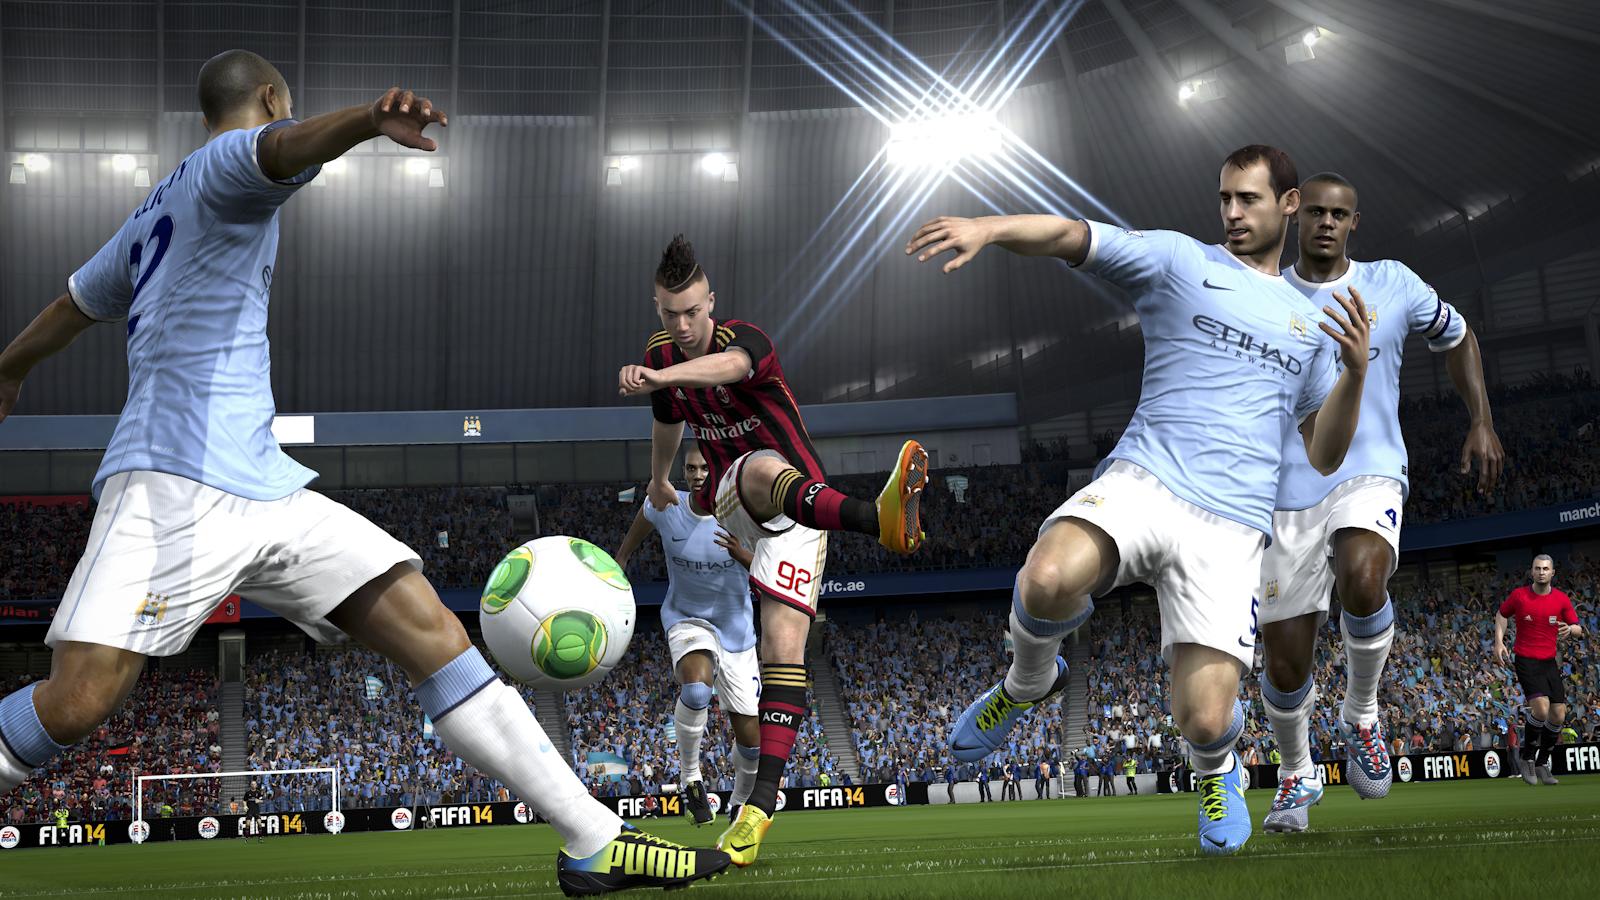 Phenomenal Novas Imagens Das Versoes Ps4 E Xbox One De Fifa 14 Zwame Jogos Short Hairstyles Gunalazisus